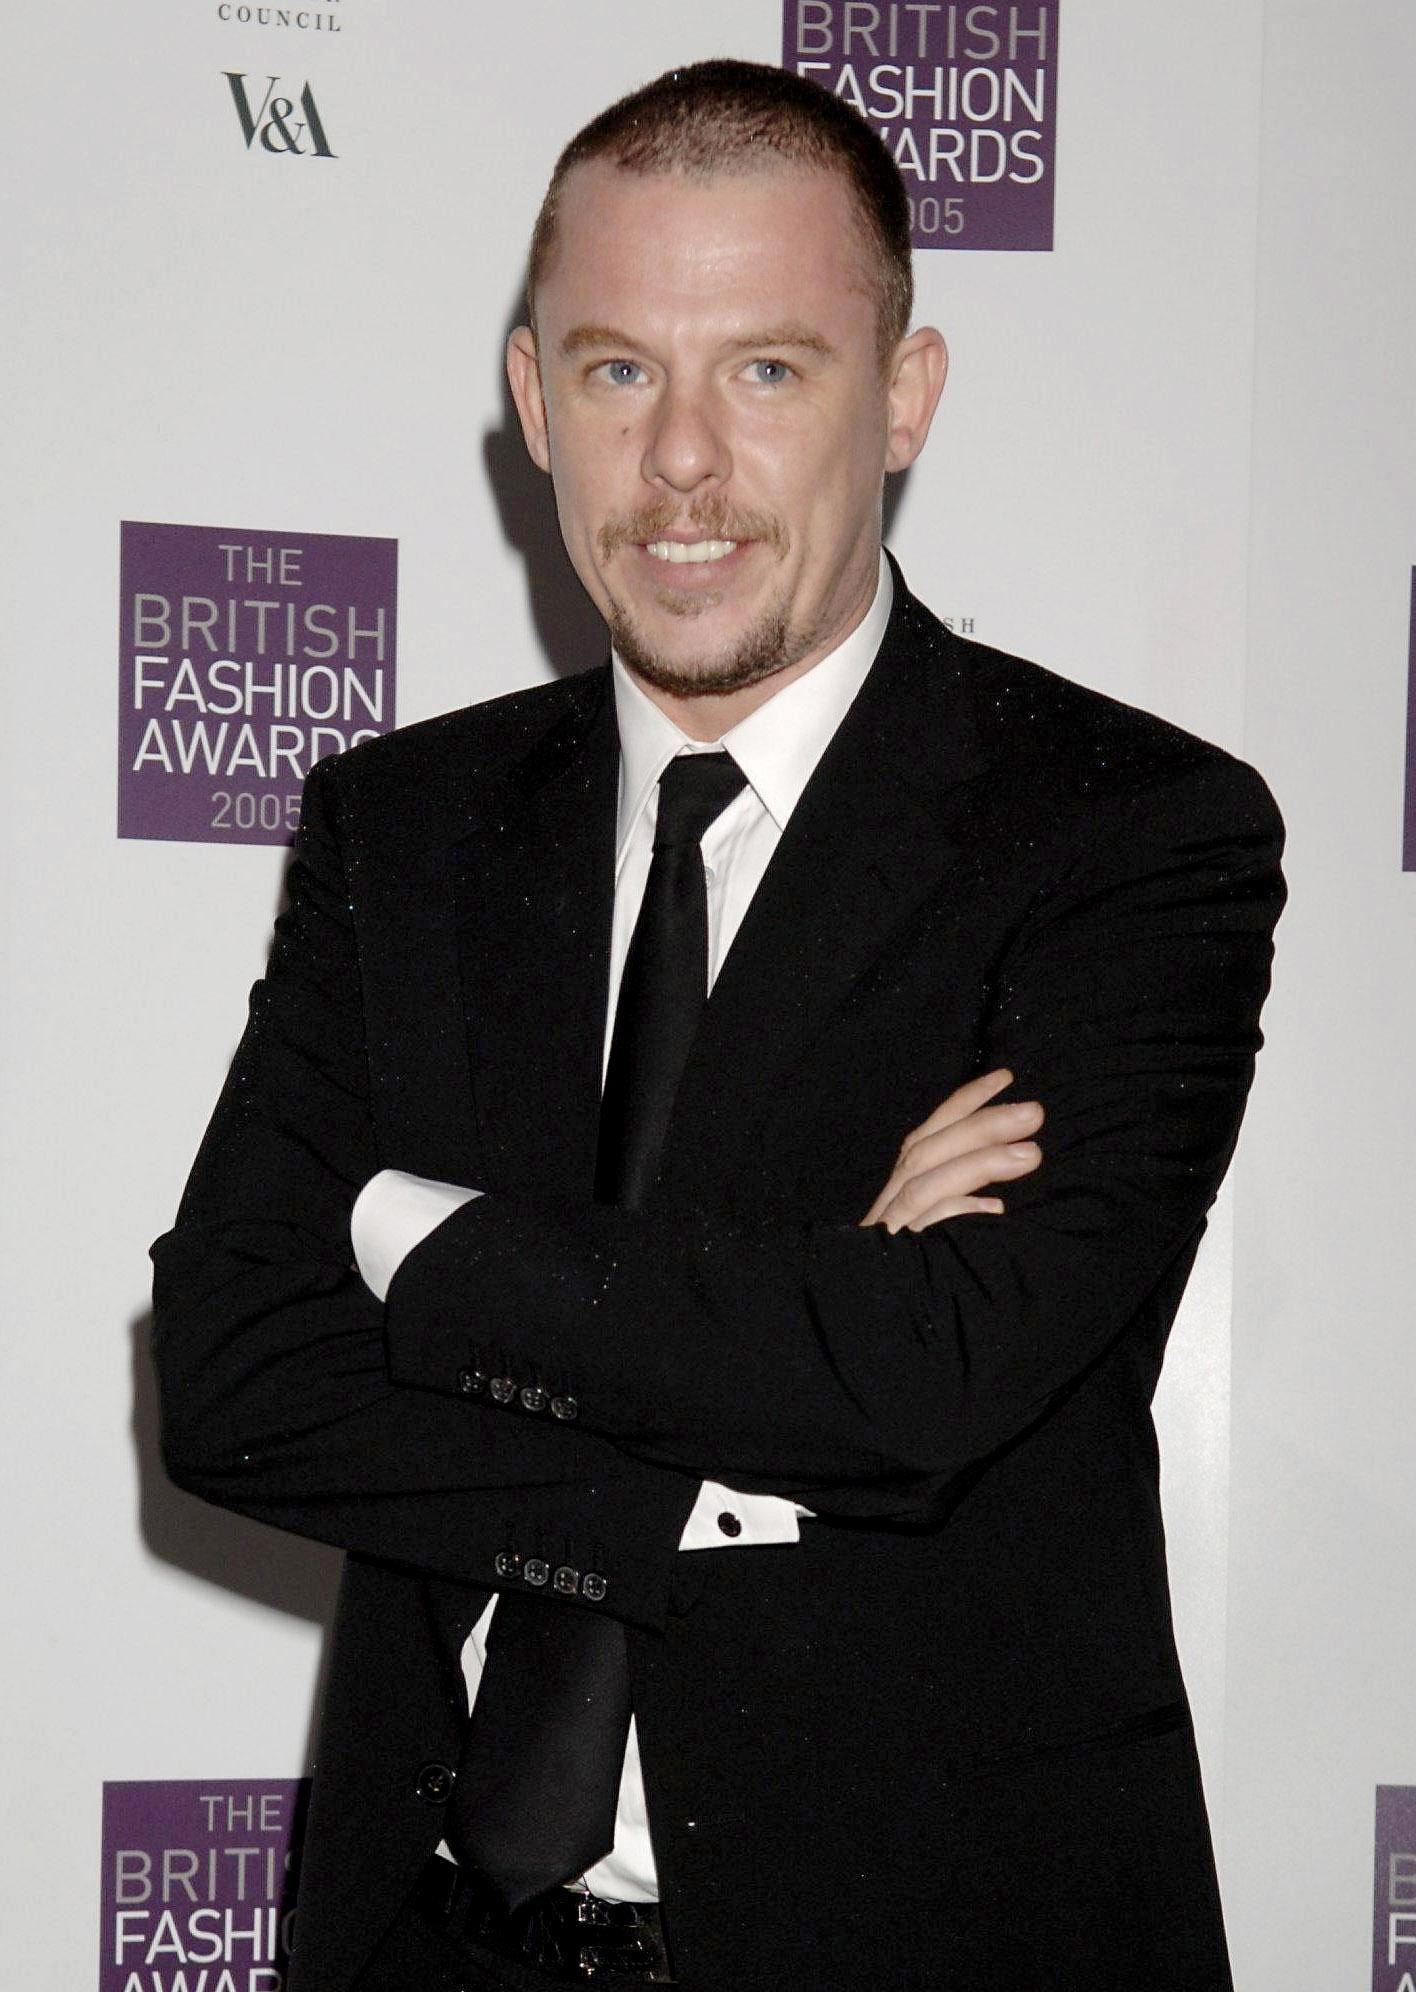 Alexander McQueen will